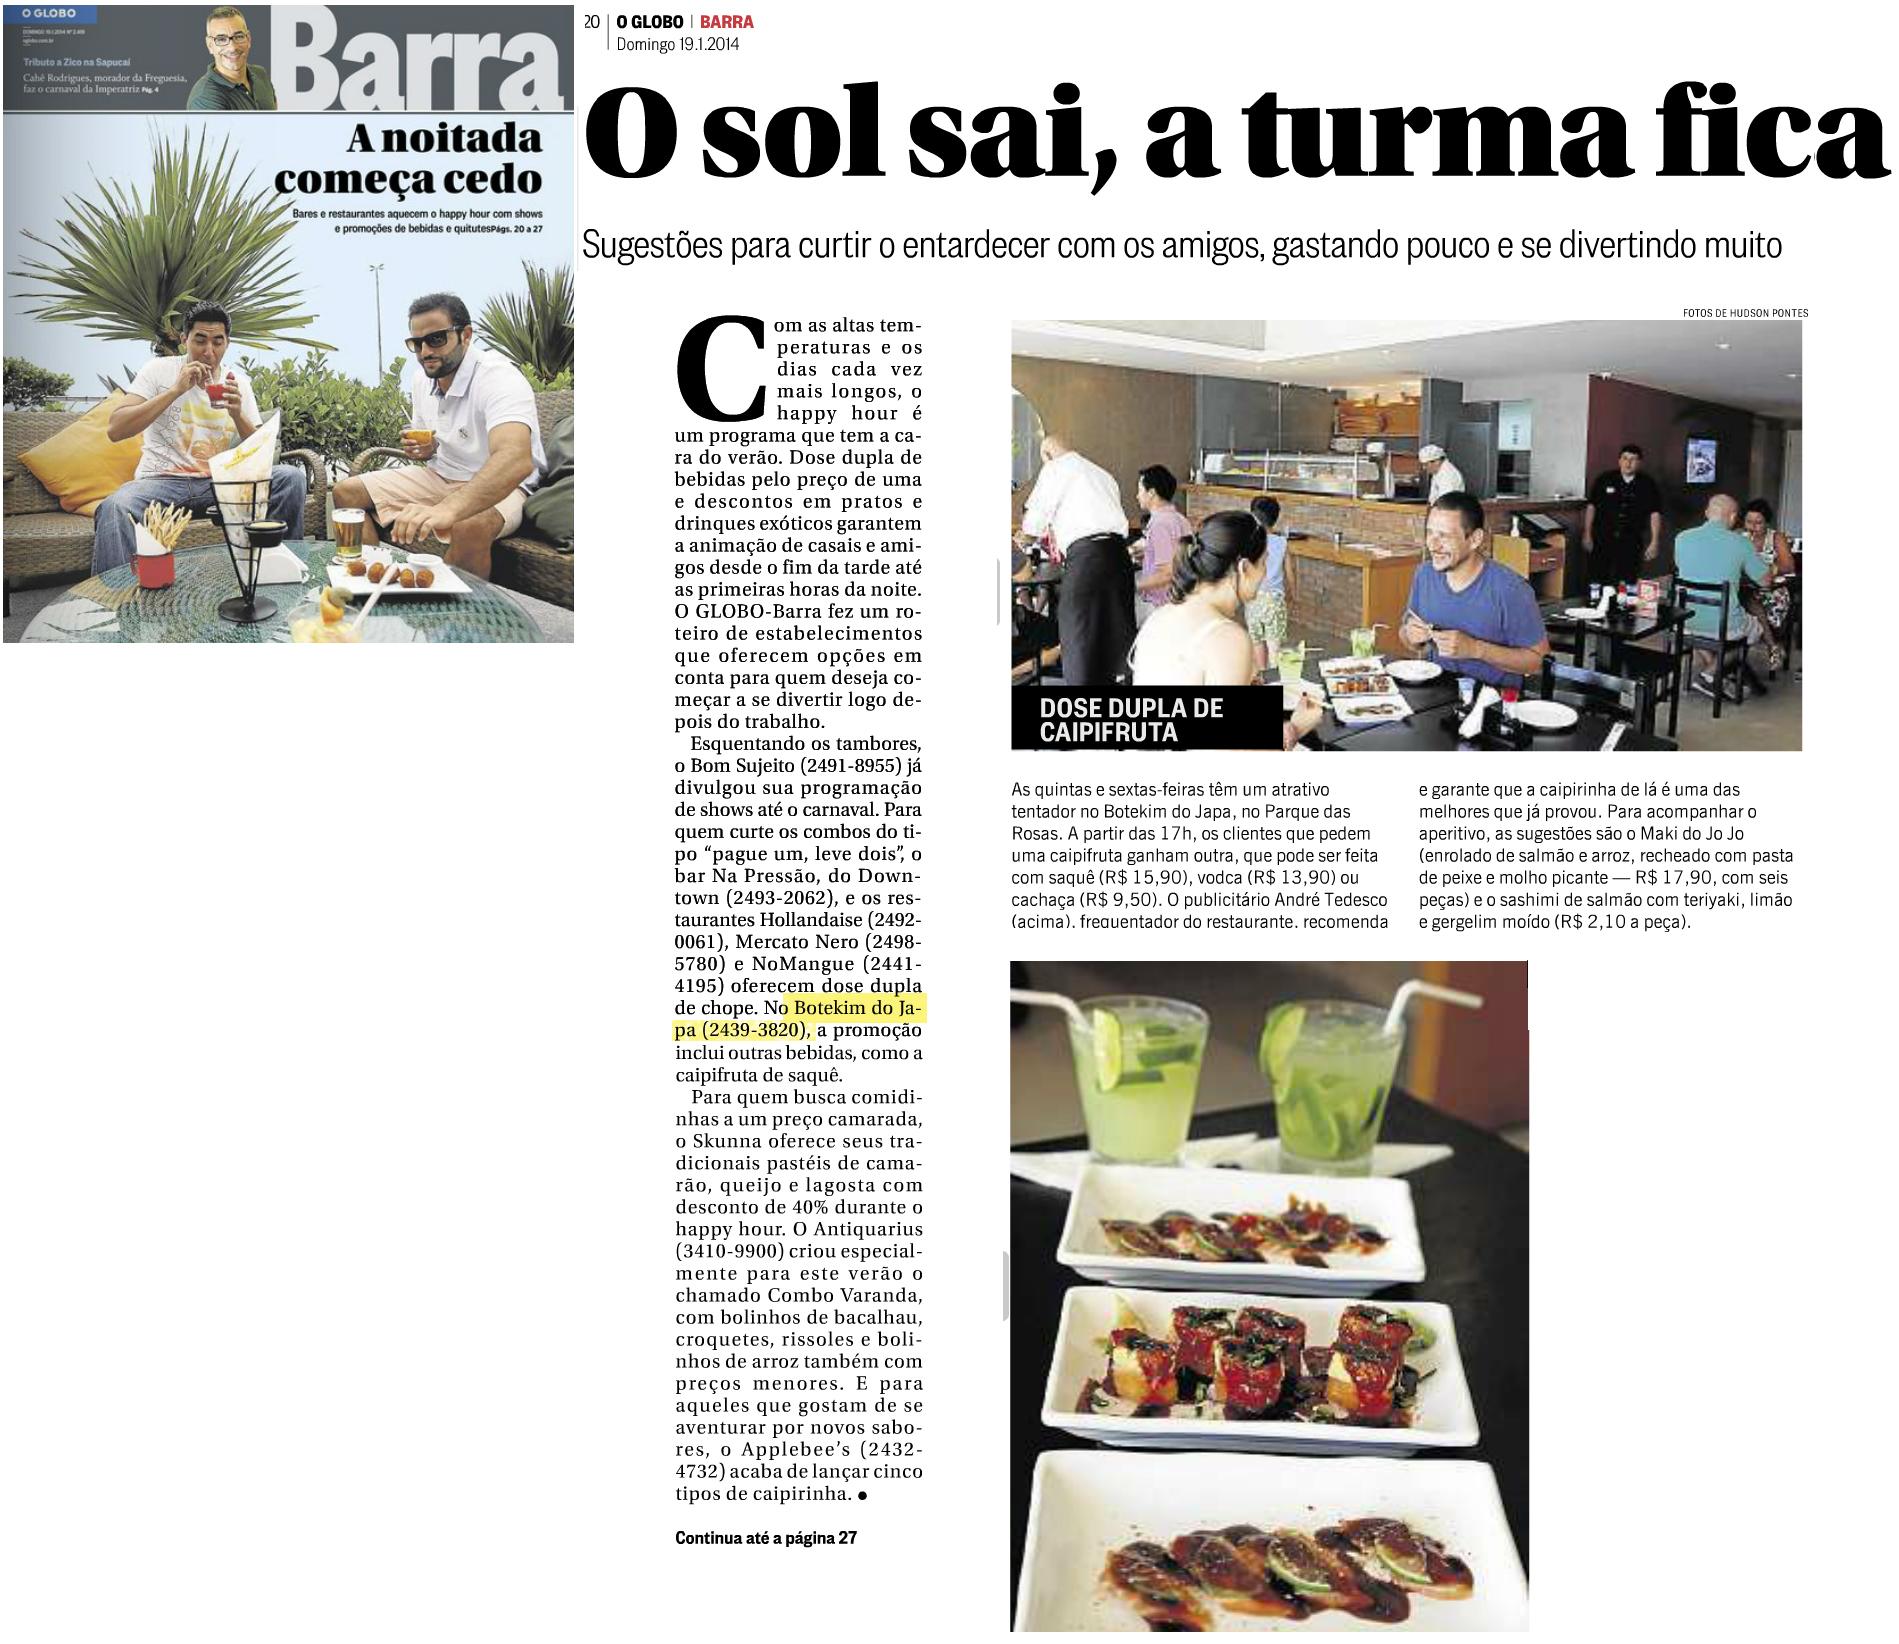 Globo Barra 19.01.14